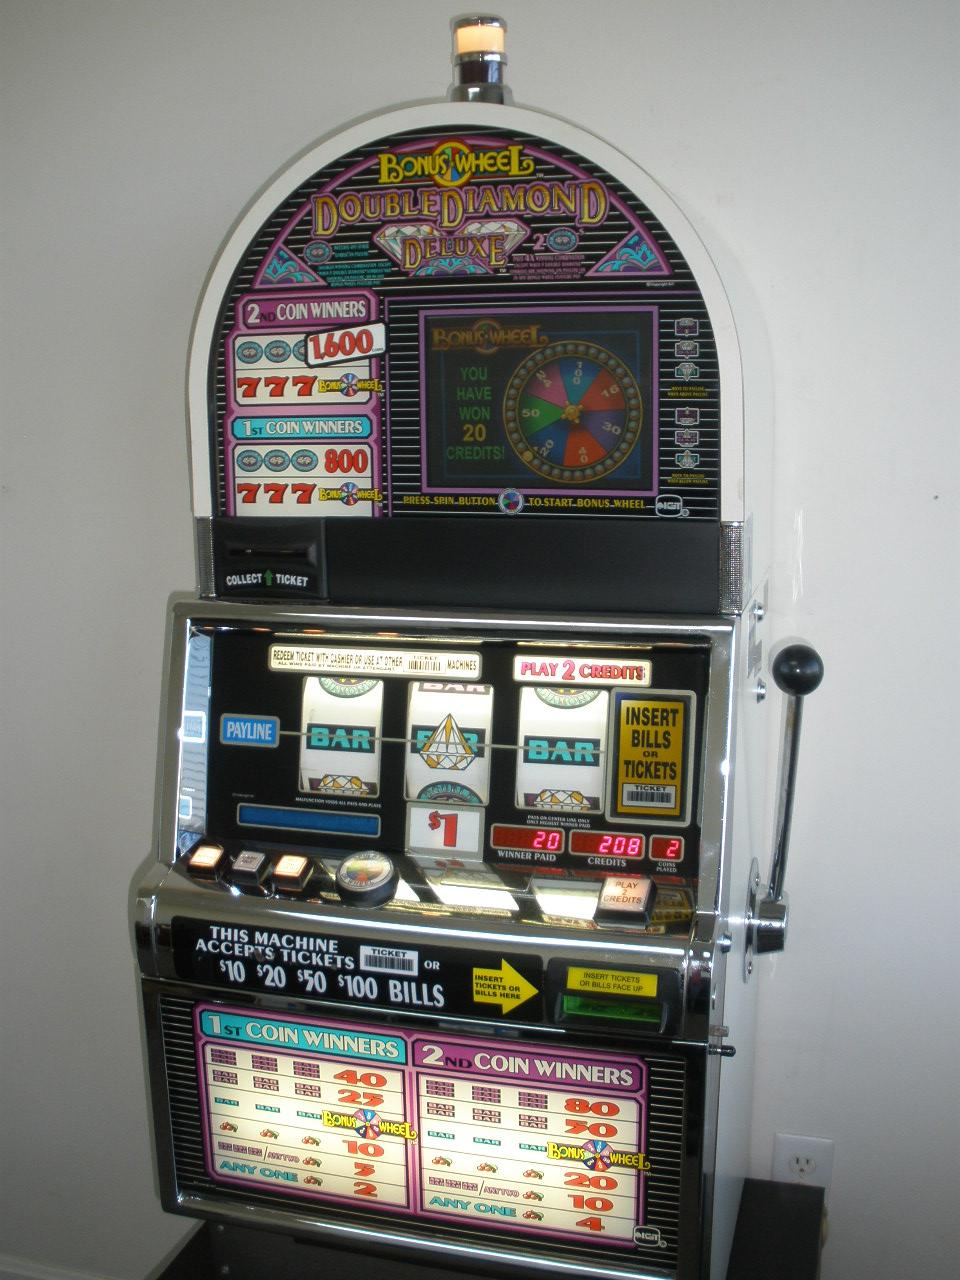 Double diamonds slot machines starmageddon 2 game